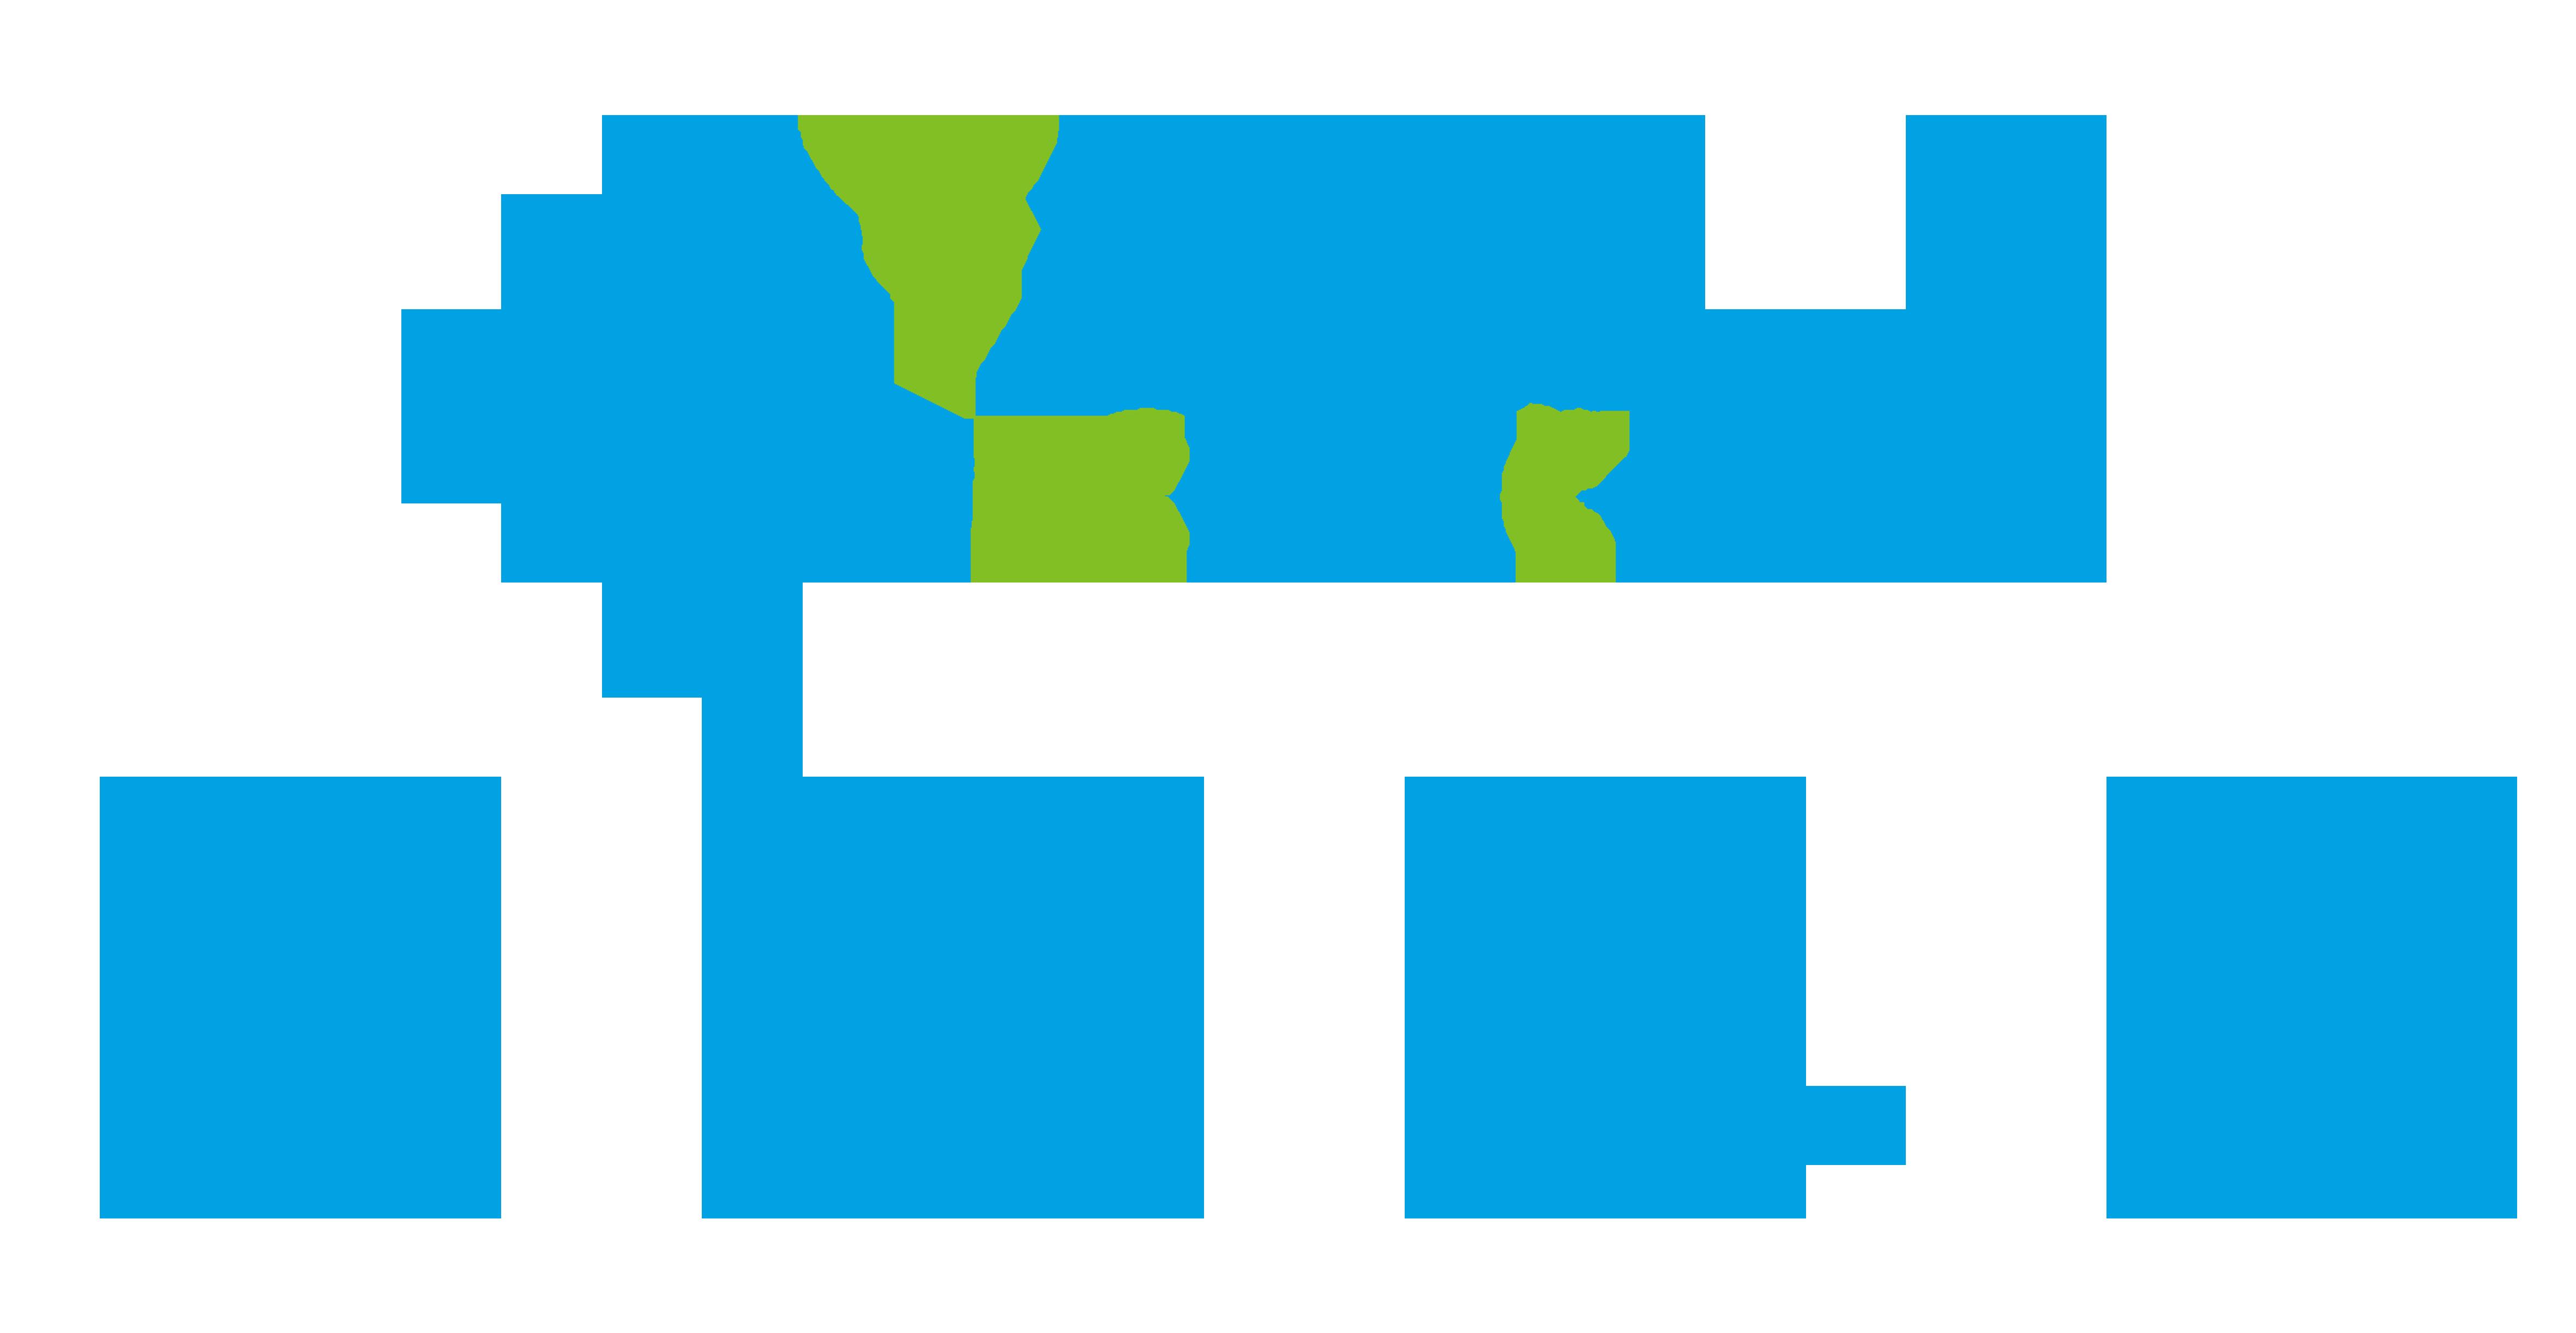 缔安科技logo.png